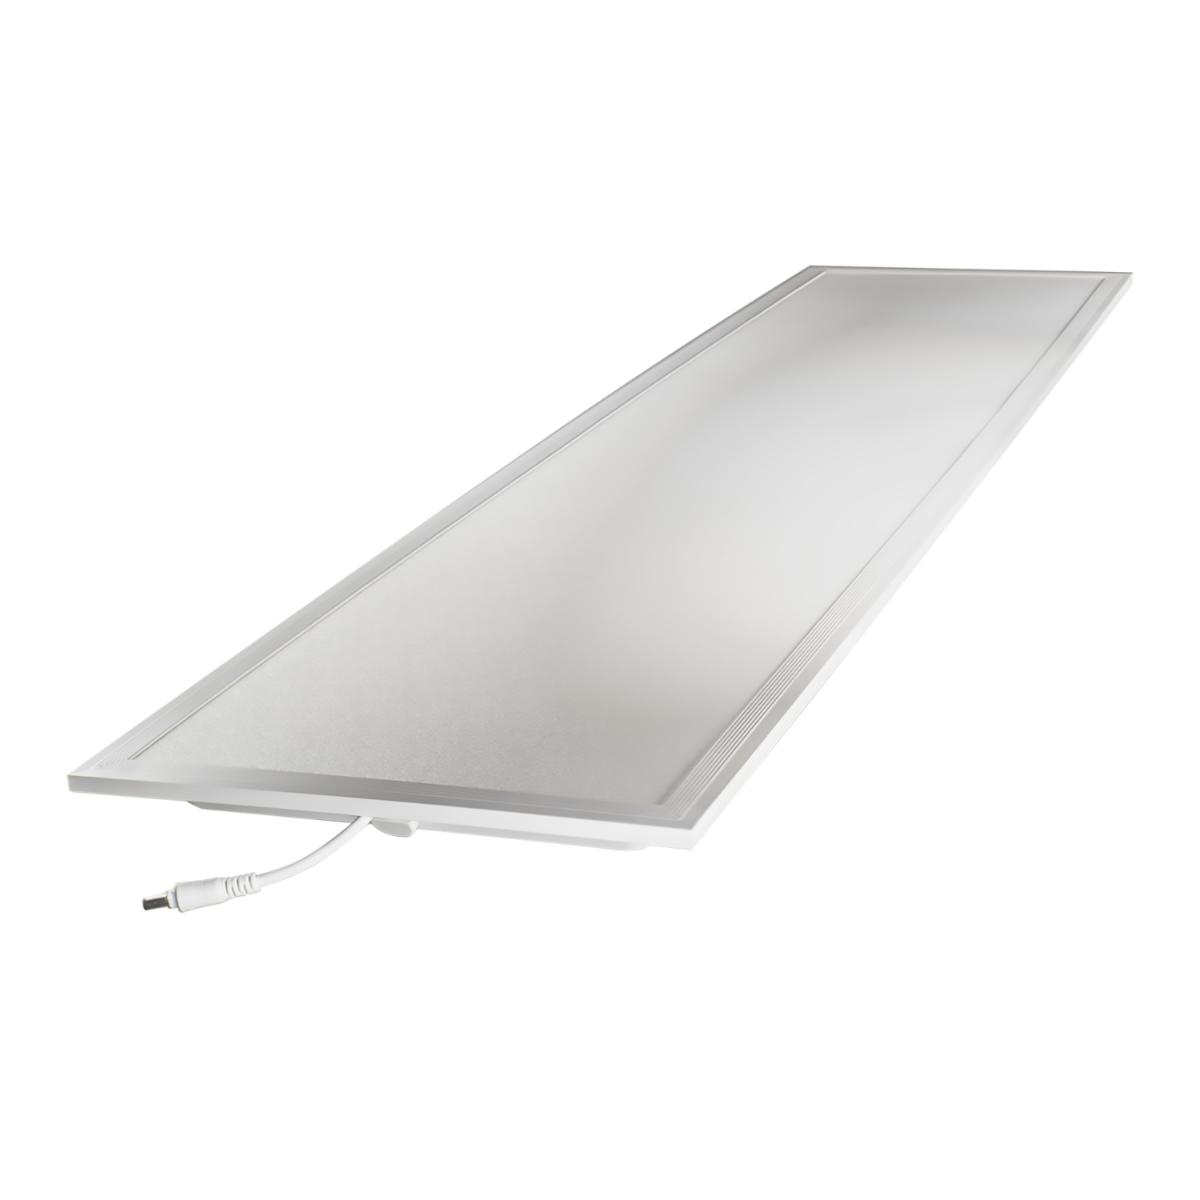 Noxion LED Paneeli Econox 32W Xitanium DALI 30x120cm 6500K 4400lm UGR <22 | Dali Himmennettävä - Päivänvalo Valkoinen - Korvaa 2x36W